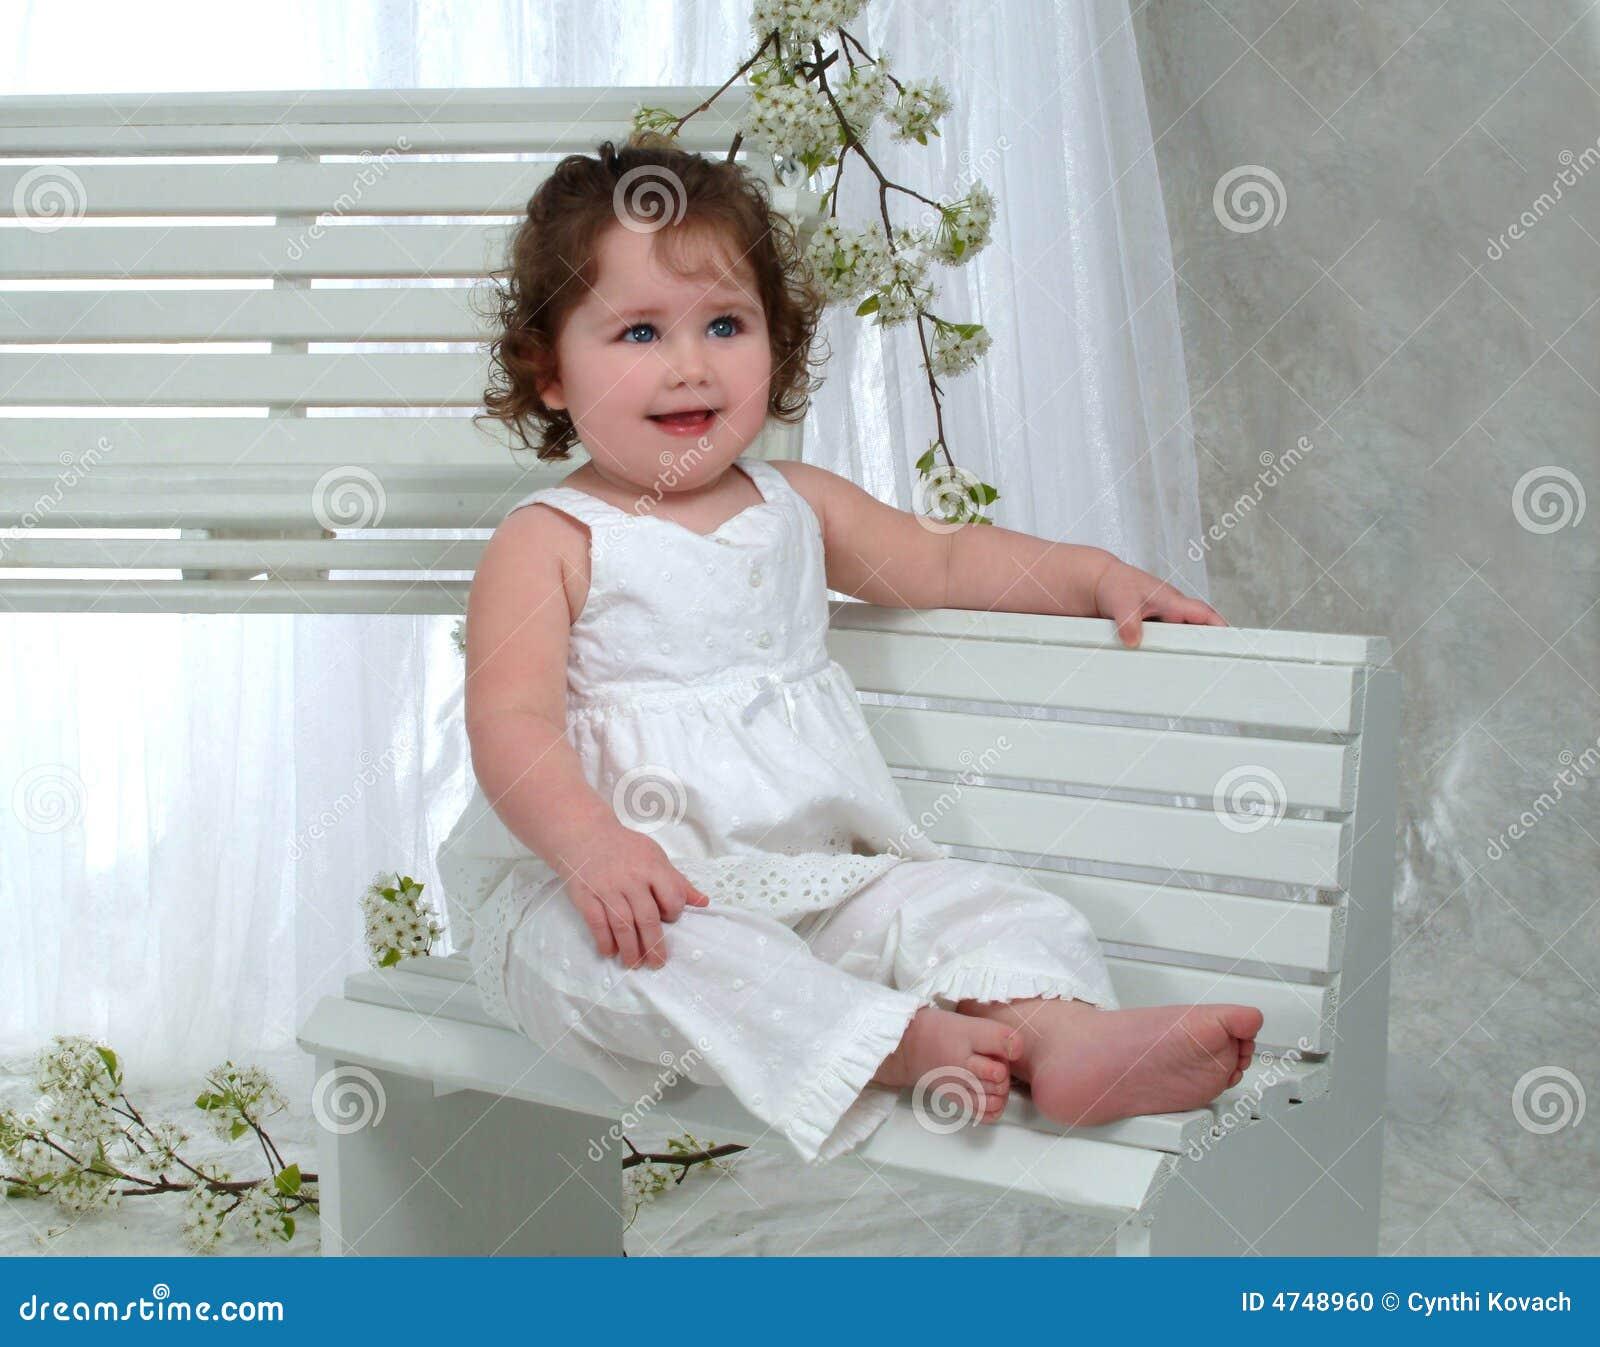 Baby Girl on bench